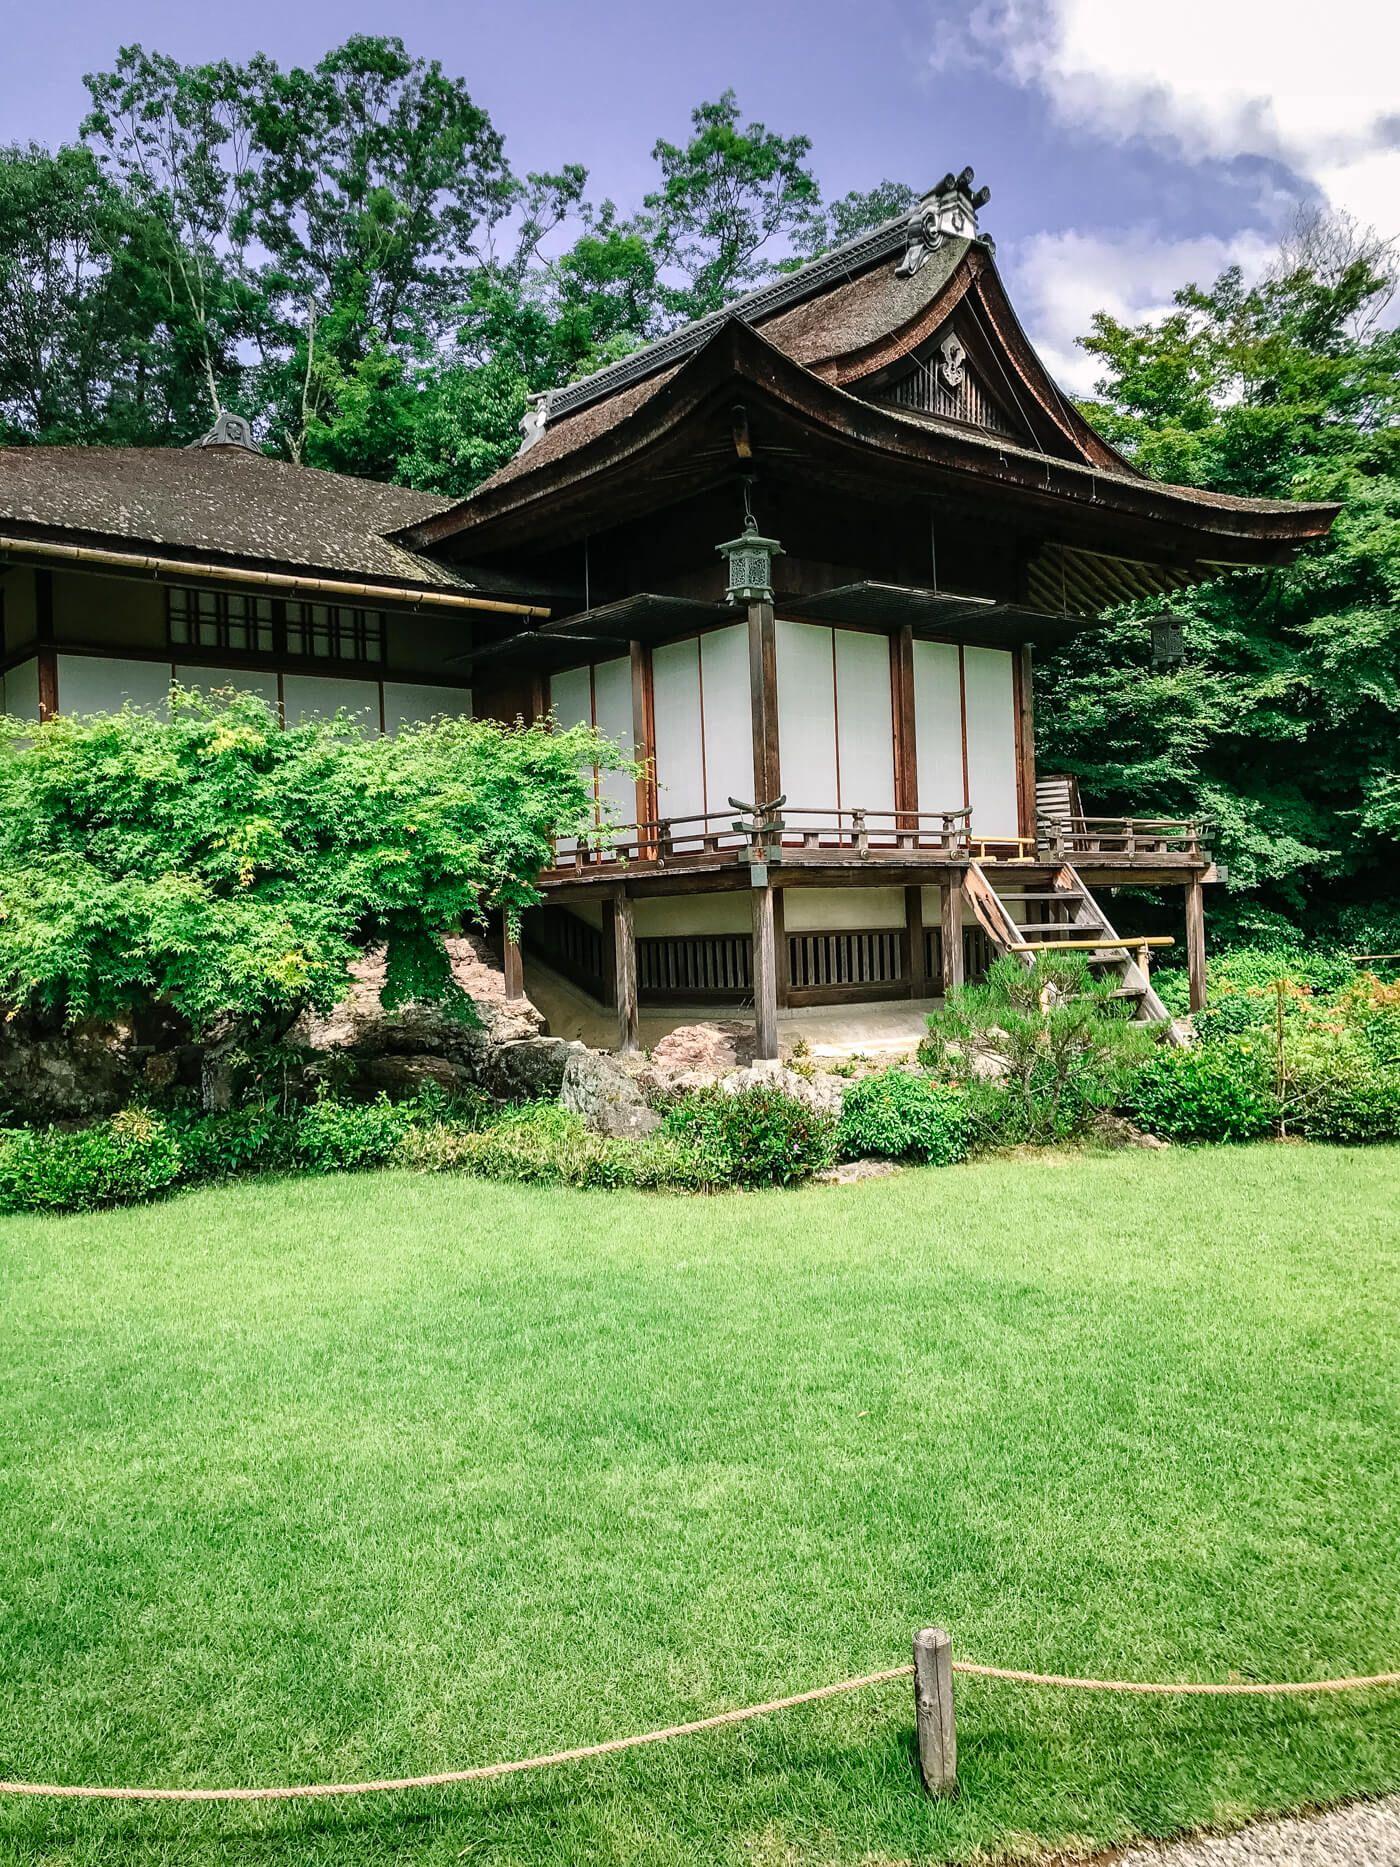 I Love Kyoto, Japan (Honeymoon Part II)